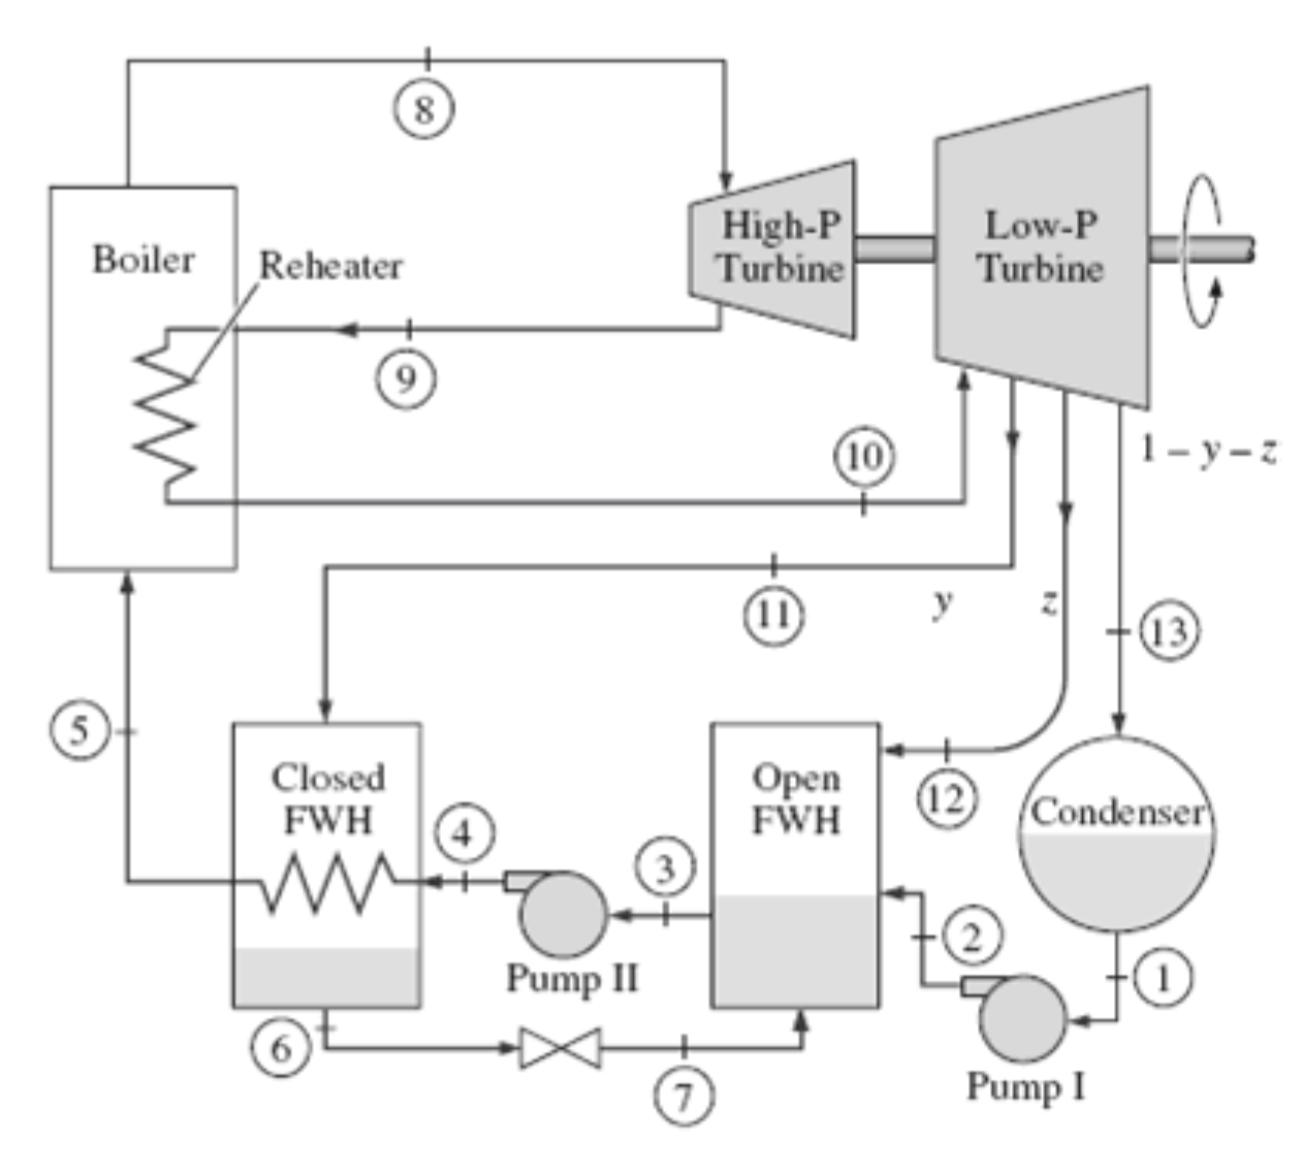 a steam power plant operates on an ideal reheat u2013 r